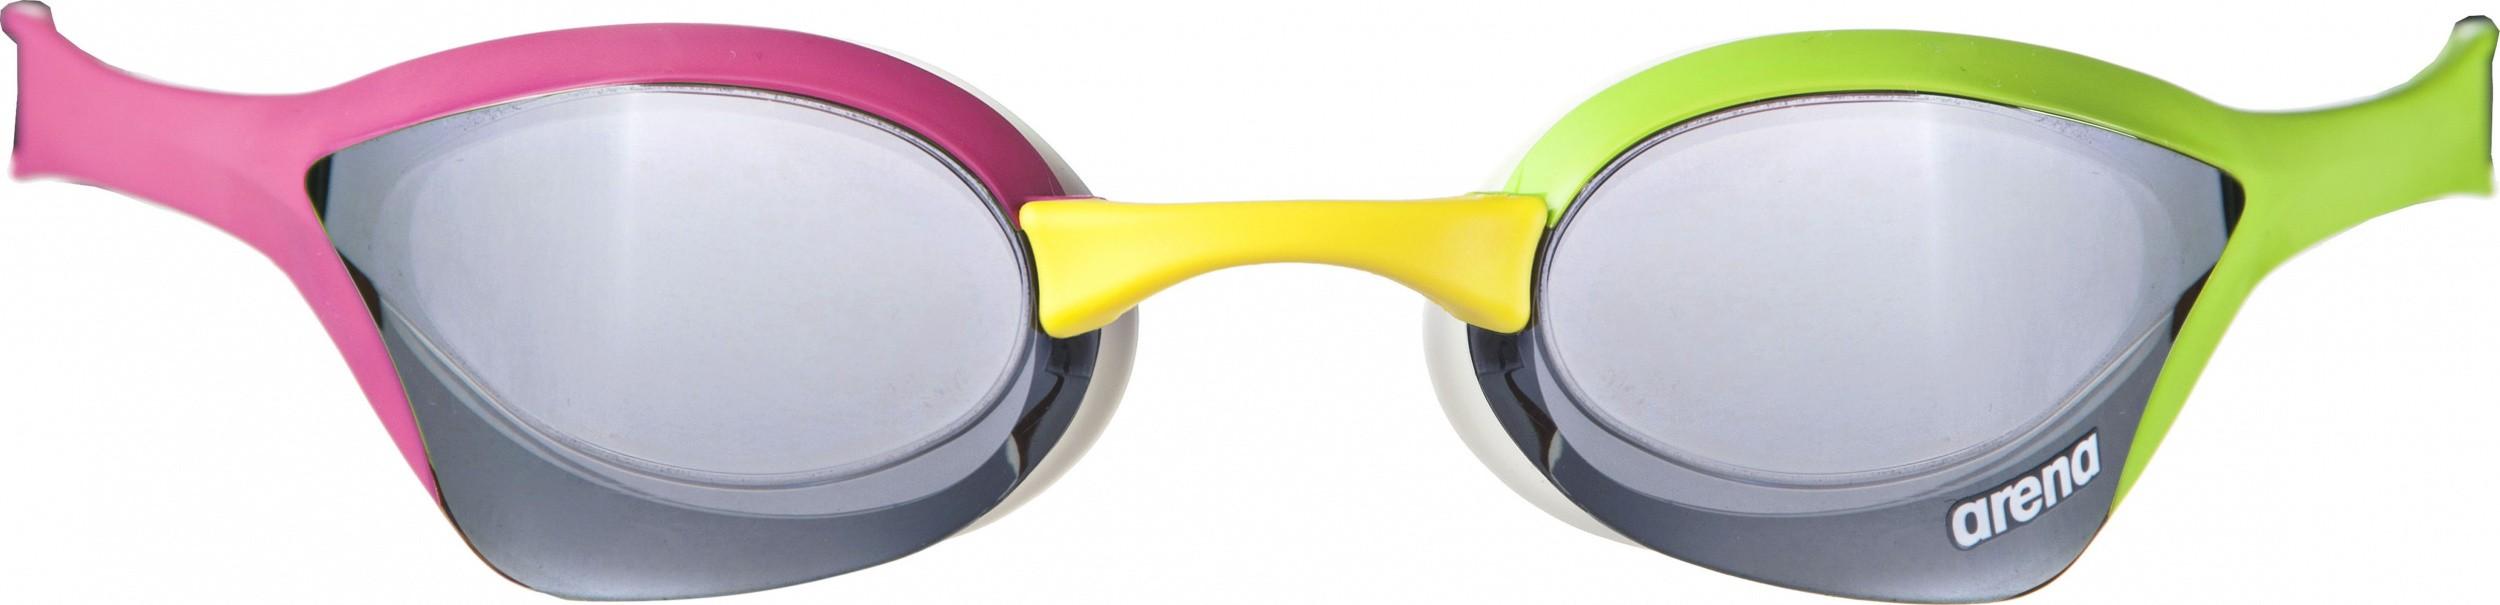 Arena zwembril Cobra Ultra Mirror silver-green-pink